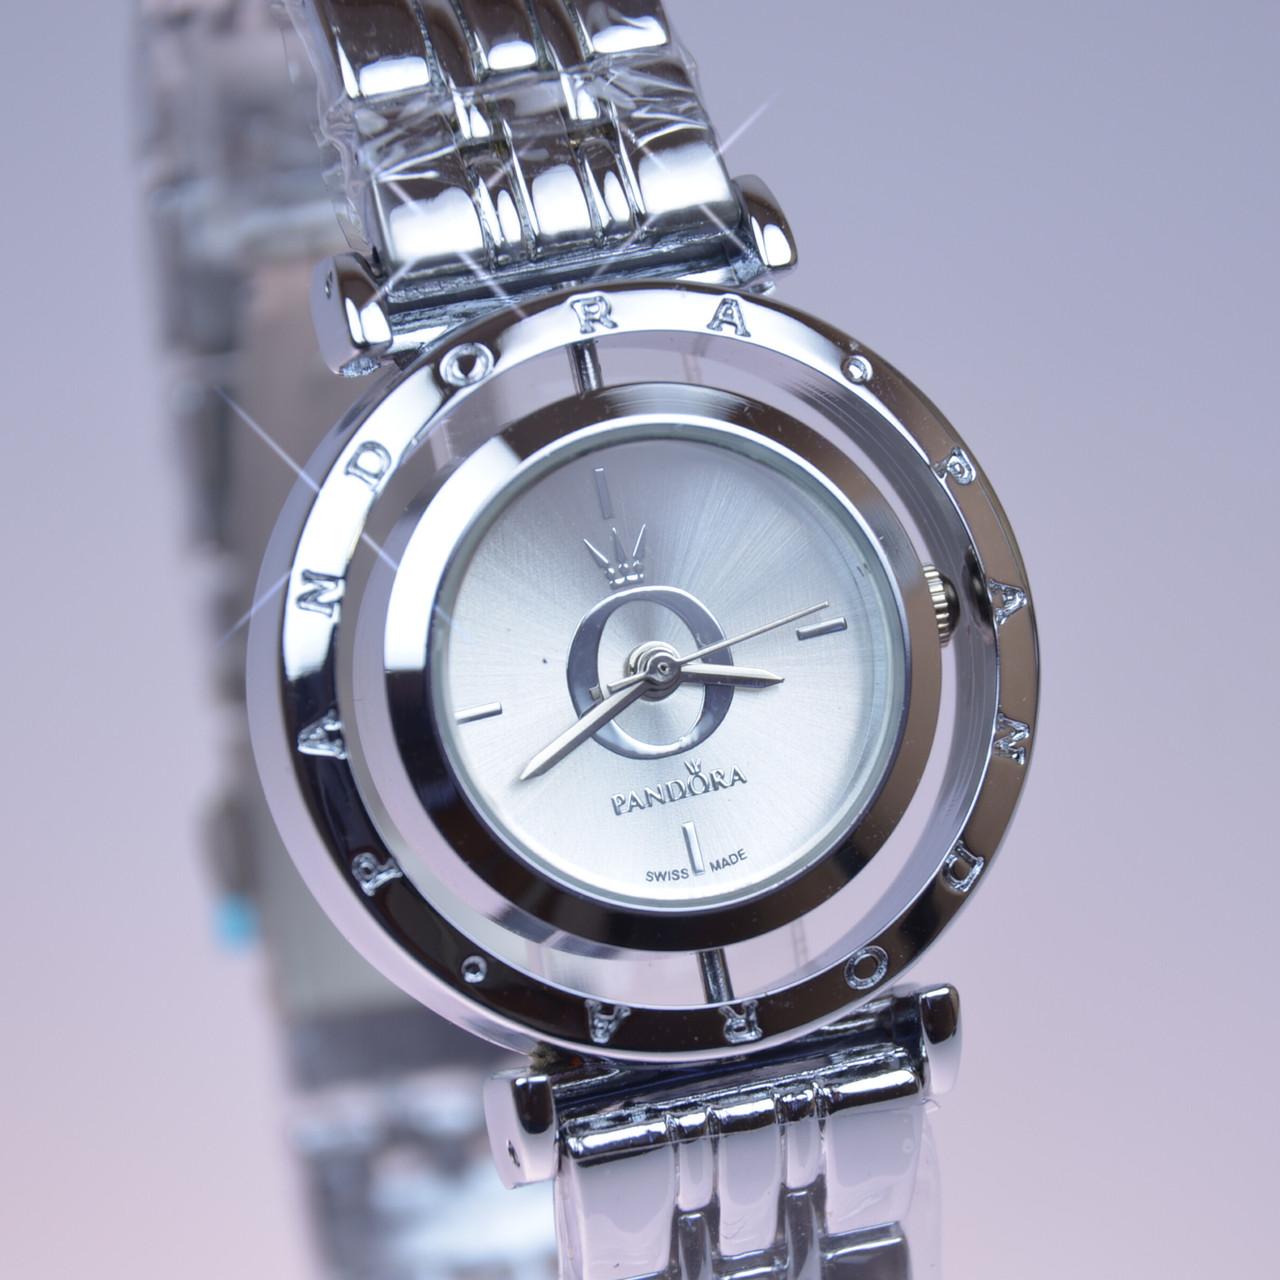 7320b1f64670 Женские часы PANDORA (Пандора) B160 Silver с вращающемся циферблатом ...